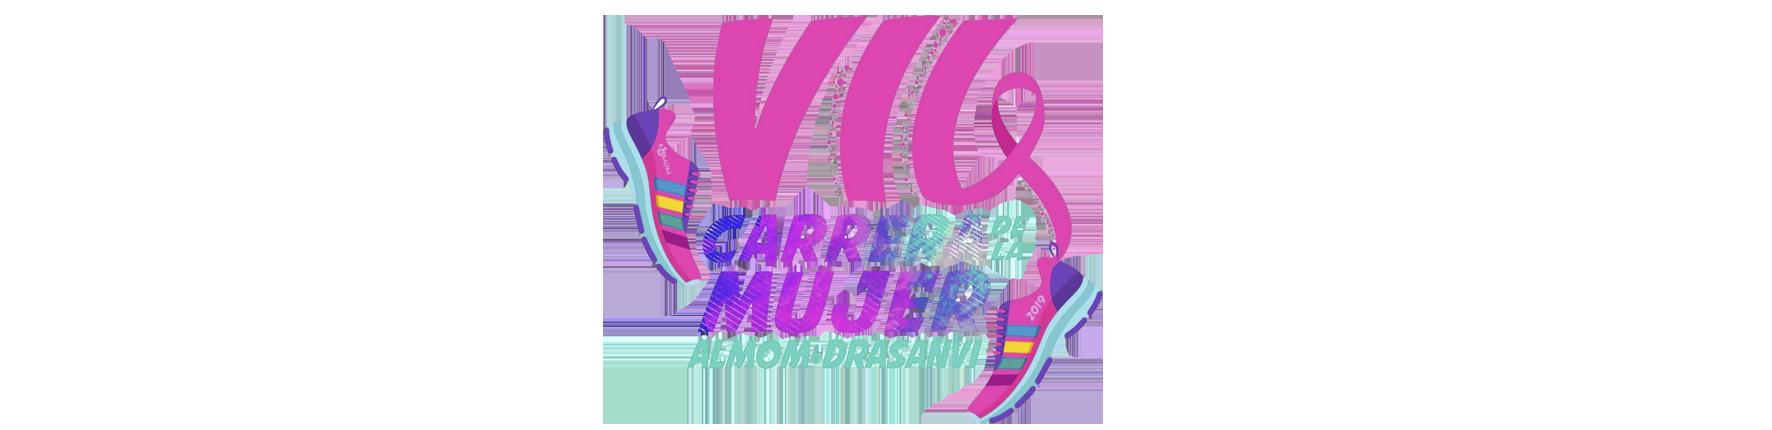 VII CARRERA DE LA MUJER (ALMOM-DRASANVI)